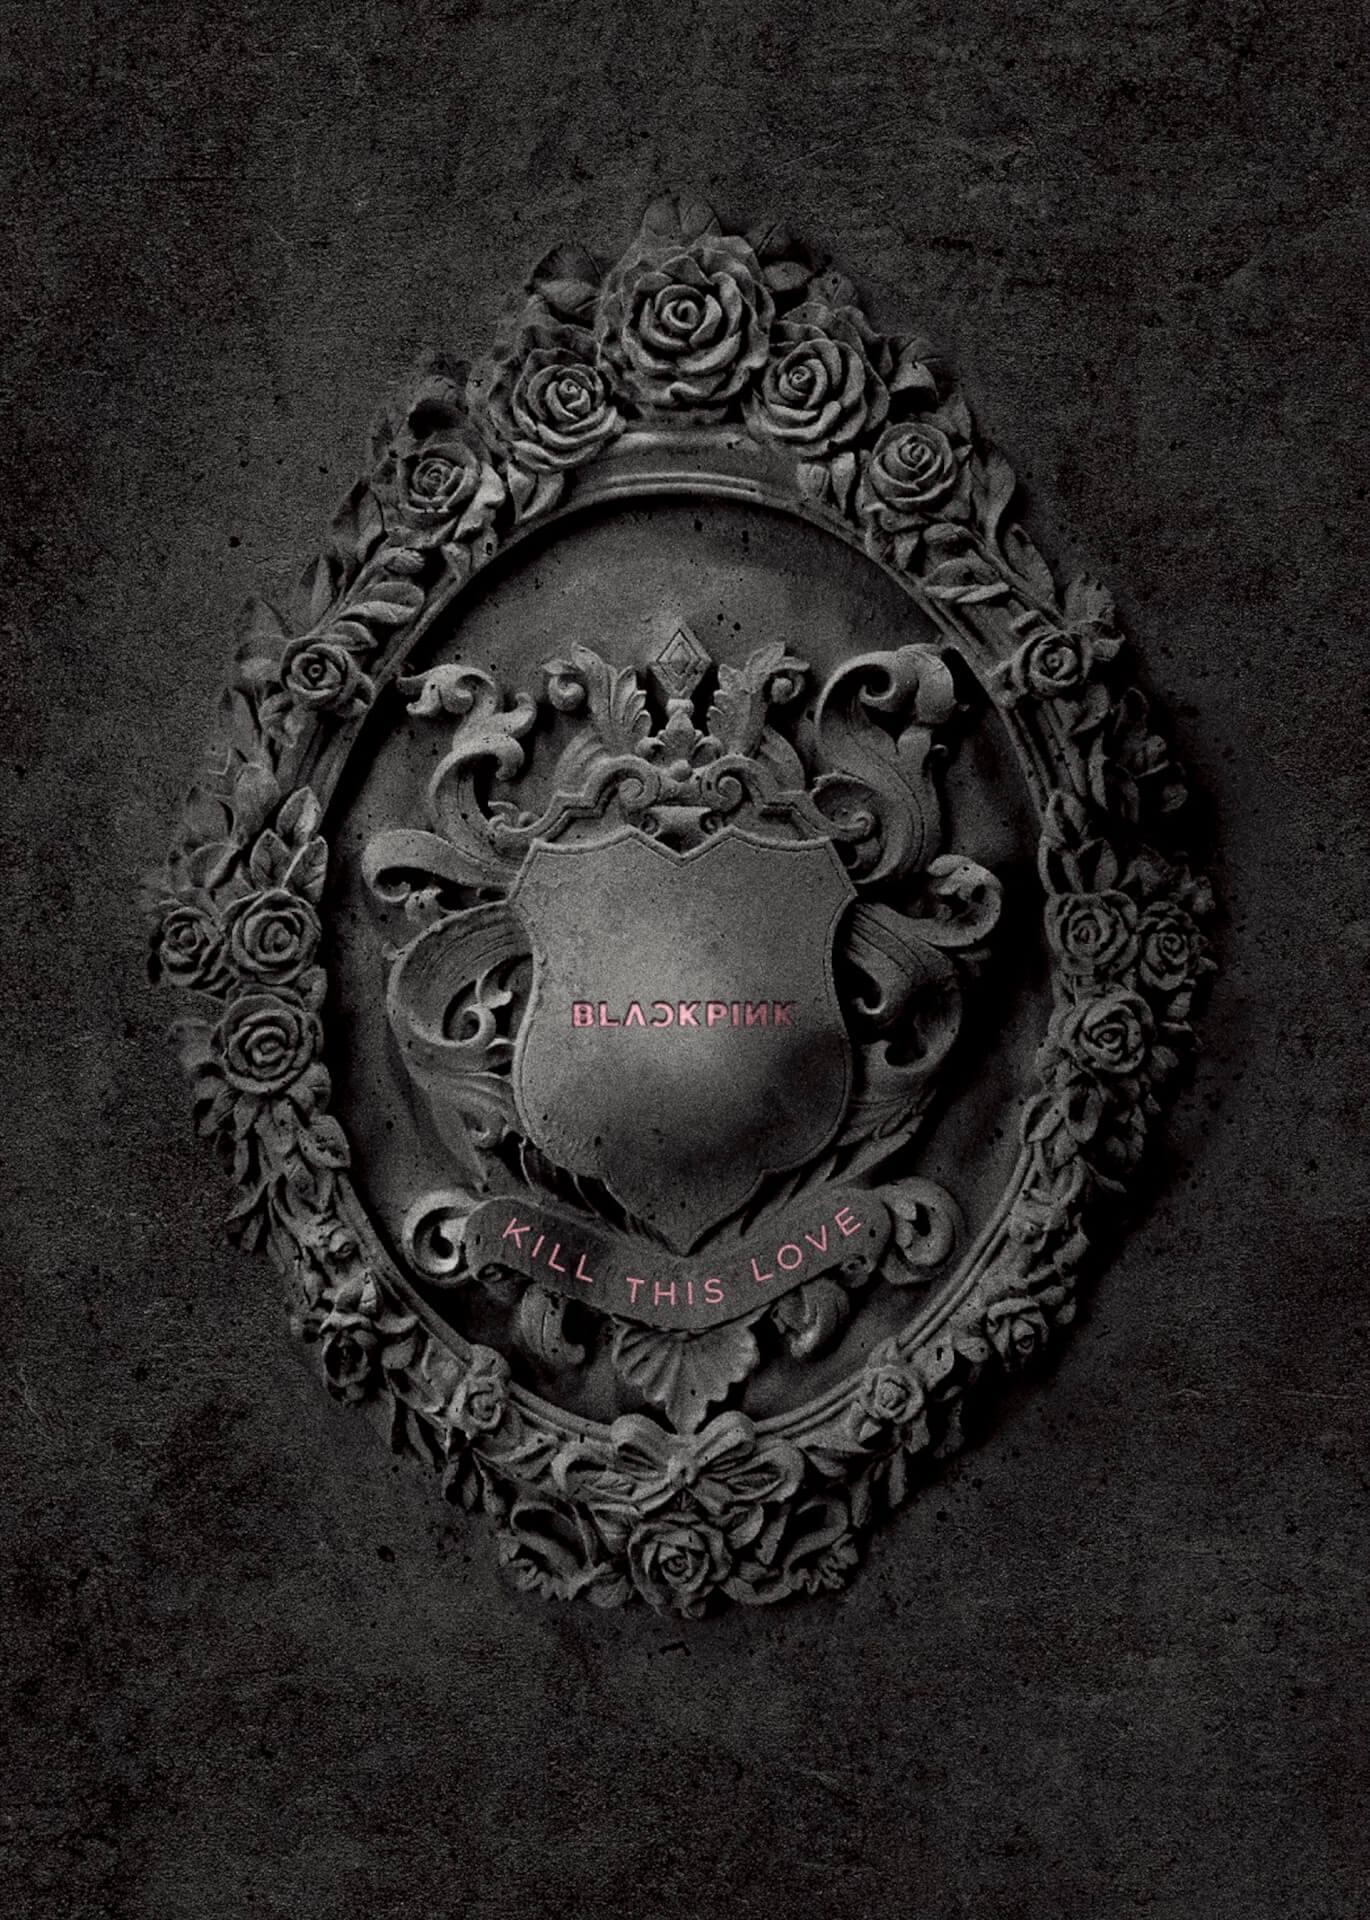 BLACKPINK「Kill This Love」MV6億再生を記録!公開から177日、グループ史上最速 music190930_blackpink_7